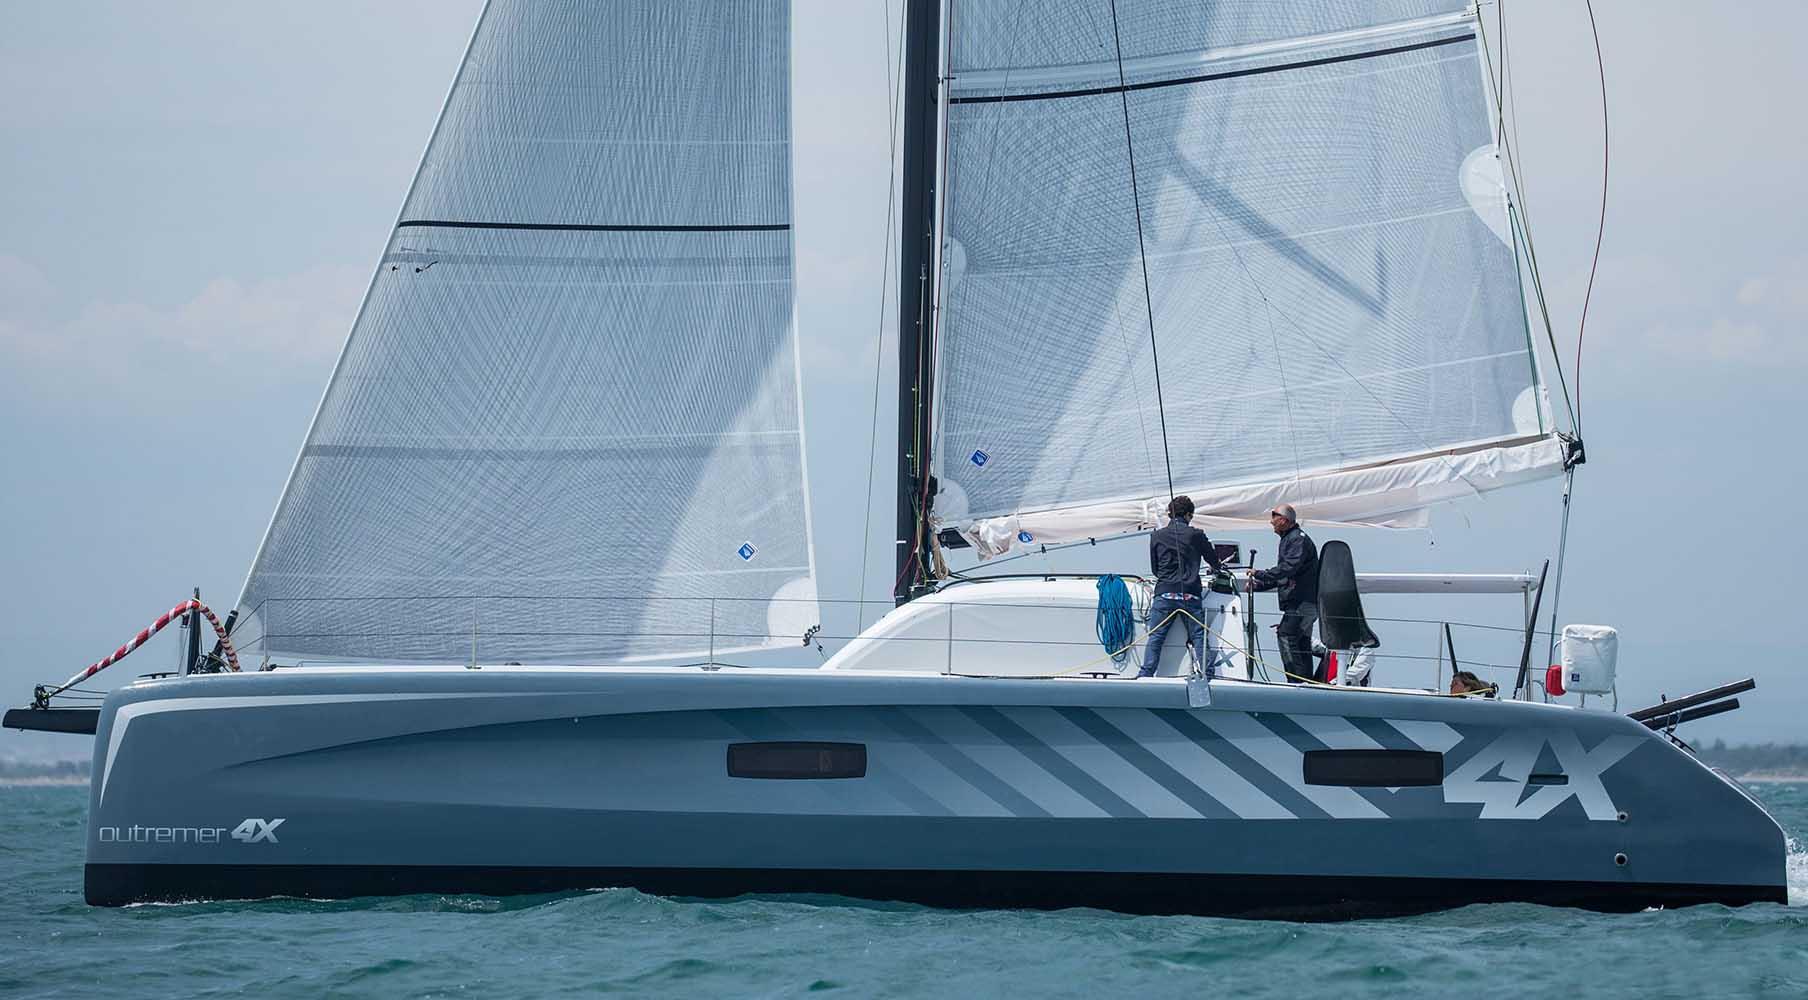 Location bateau  Outremer 45 4X